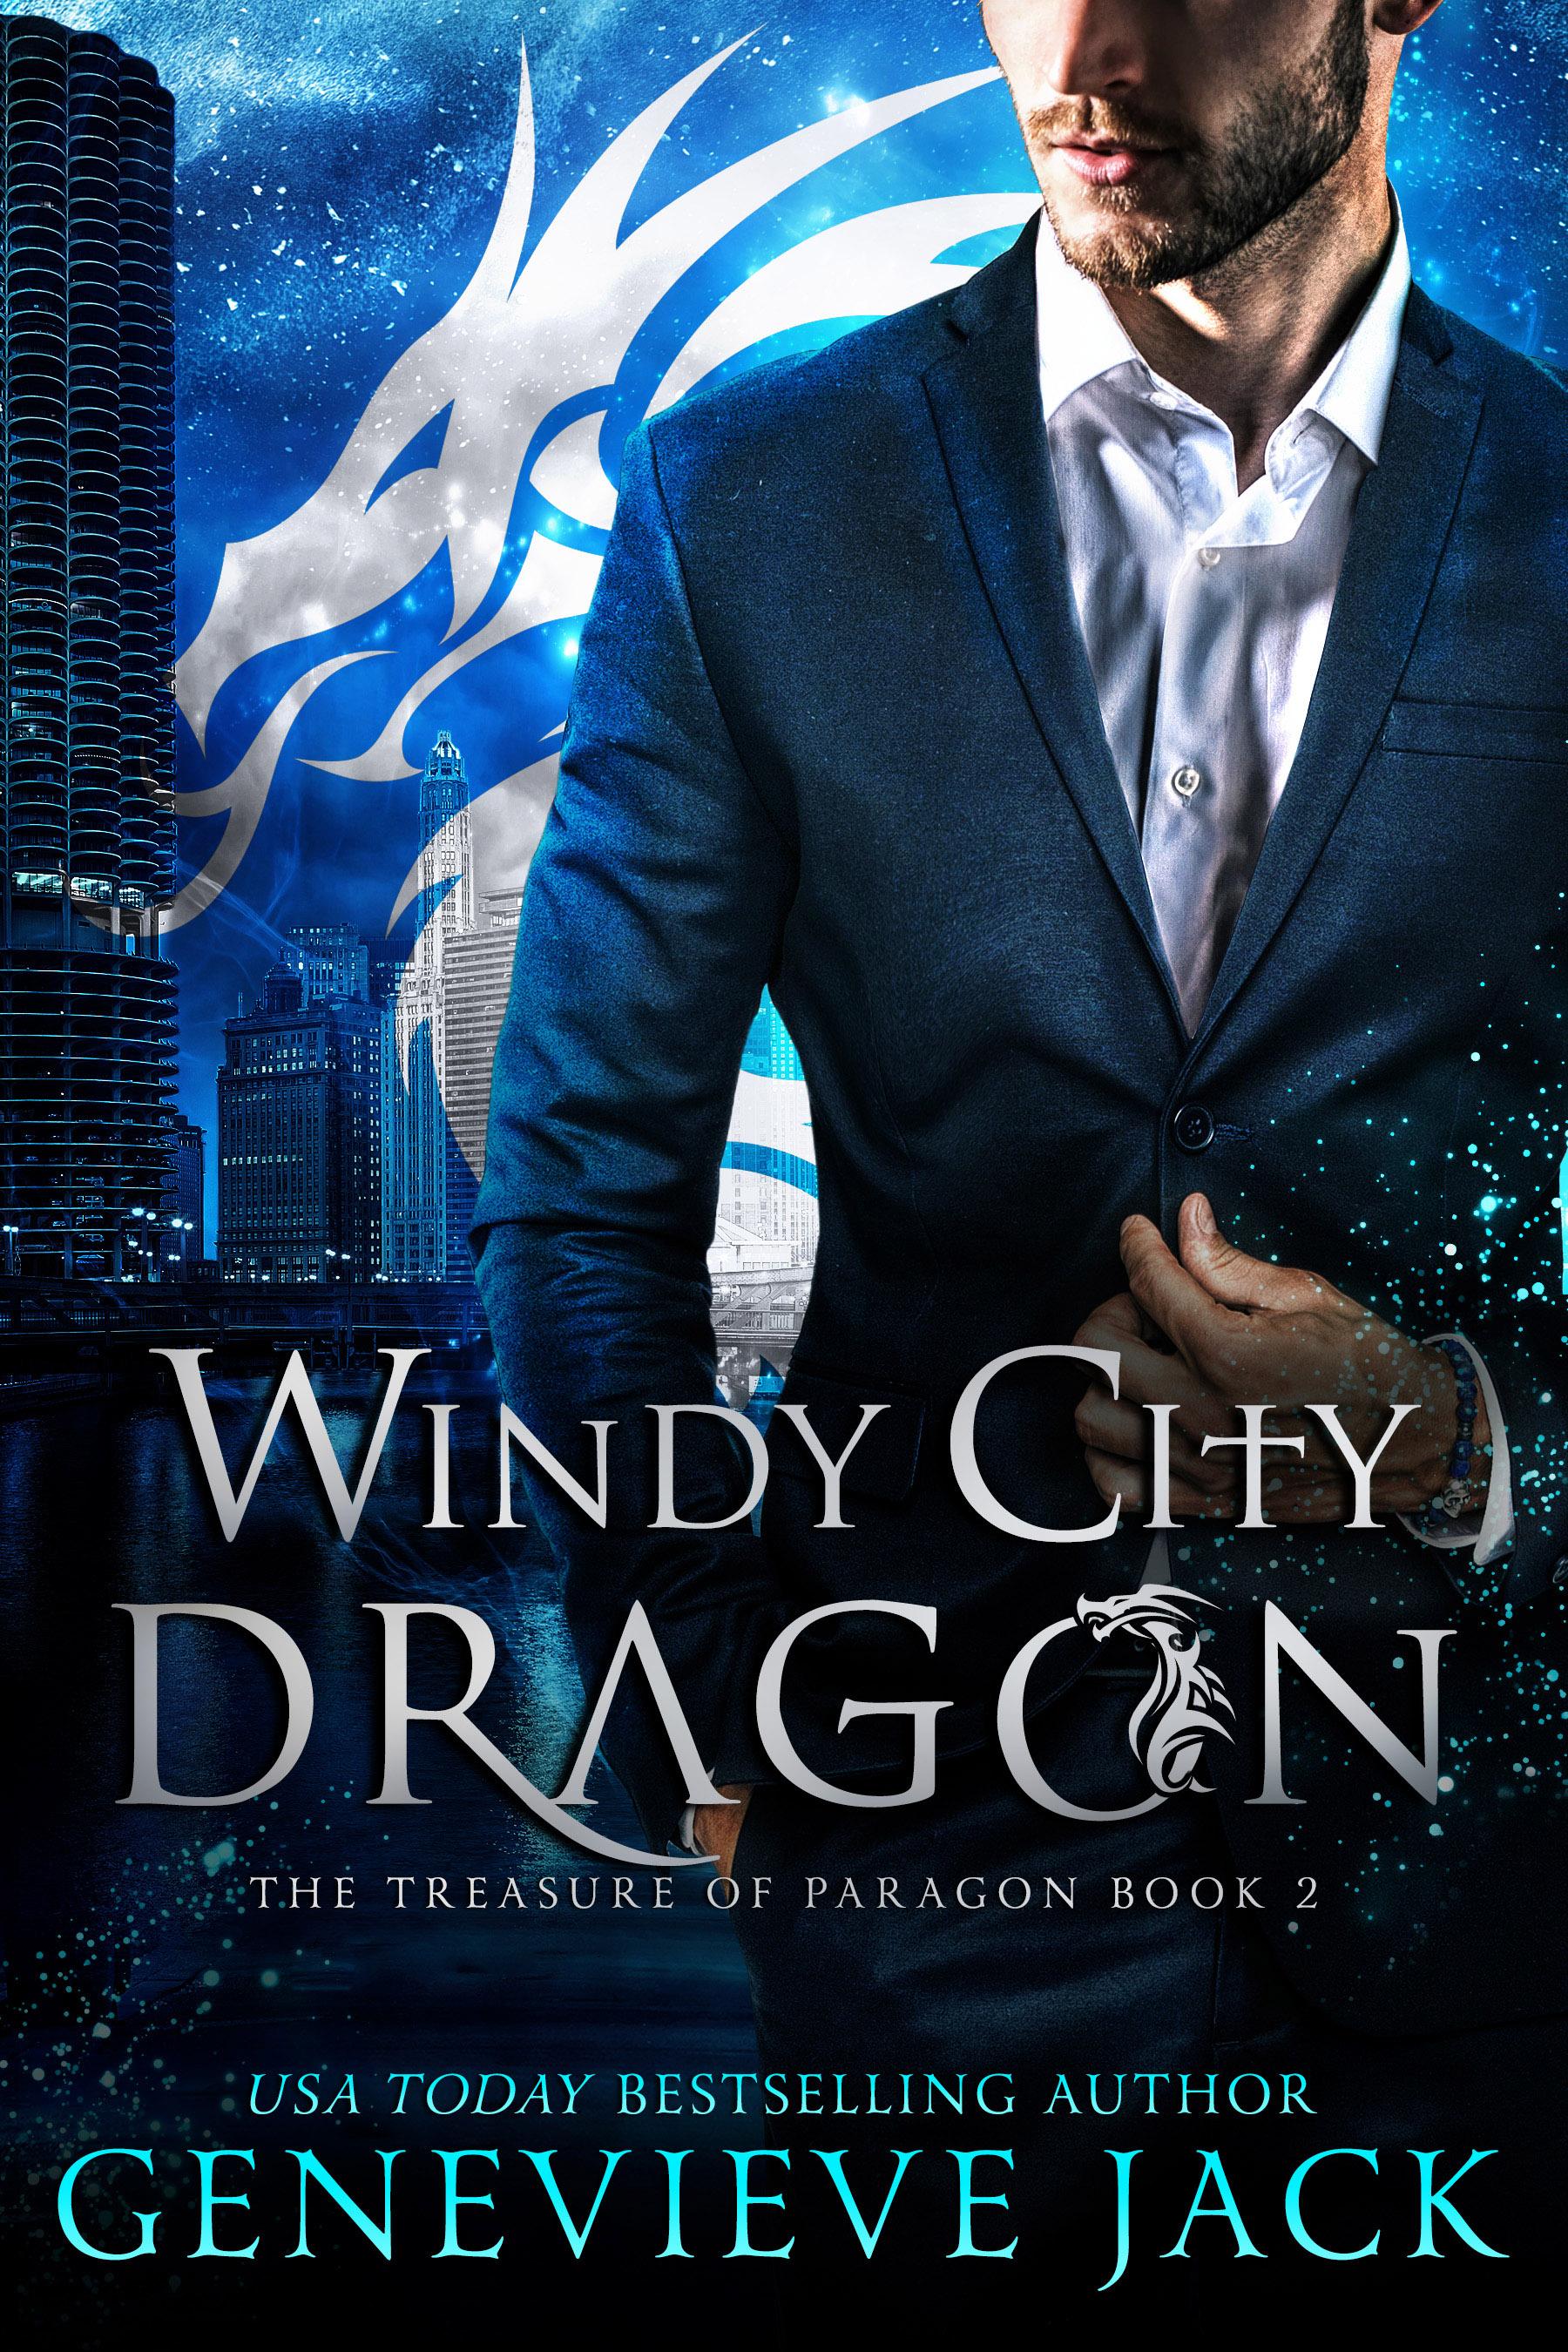 Windy City Dragon - by Genevieve Jack